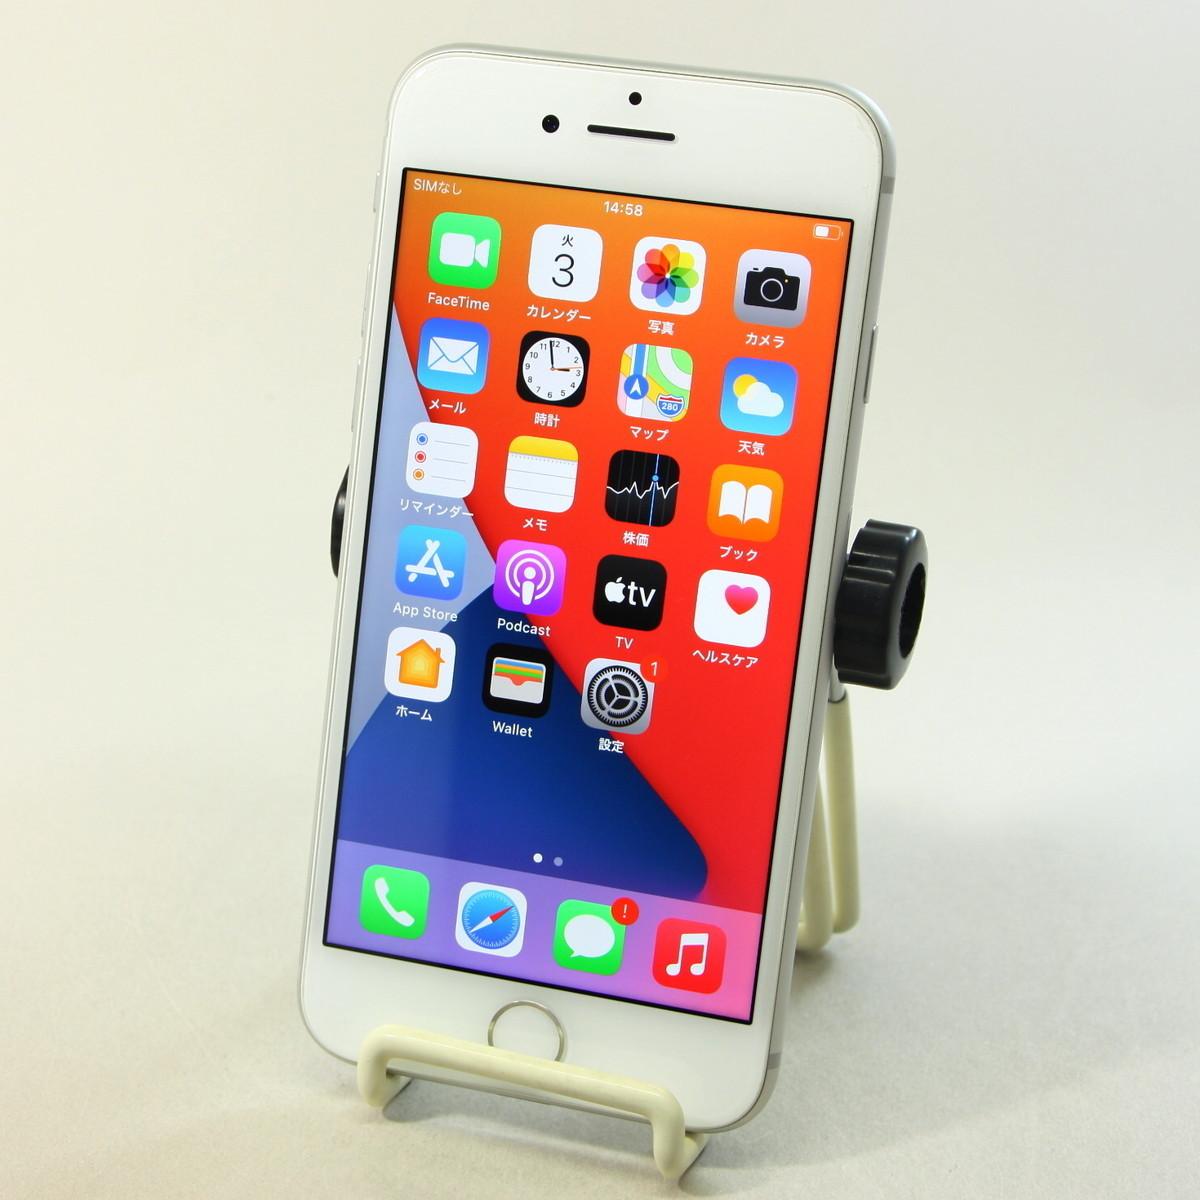 Apple iPhone8 64GB Silver A1906 NQ792J/A バッテリ99%■SIMフリー(SIMロック解除済)★Joshin(ジャンク)7465【送料無料・1円】